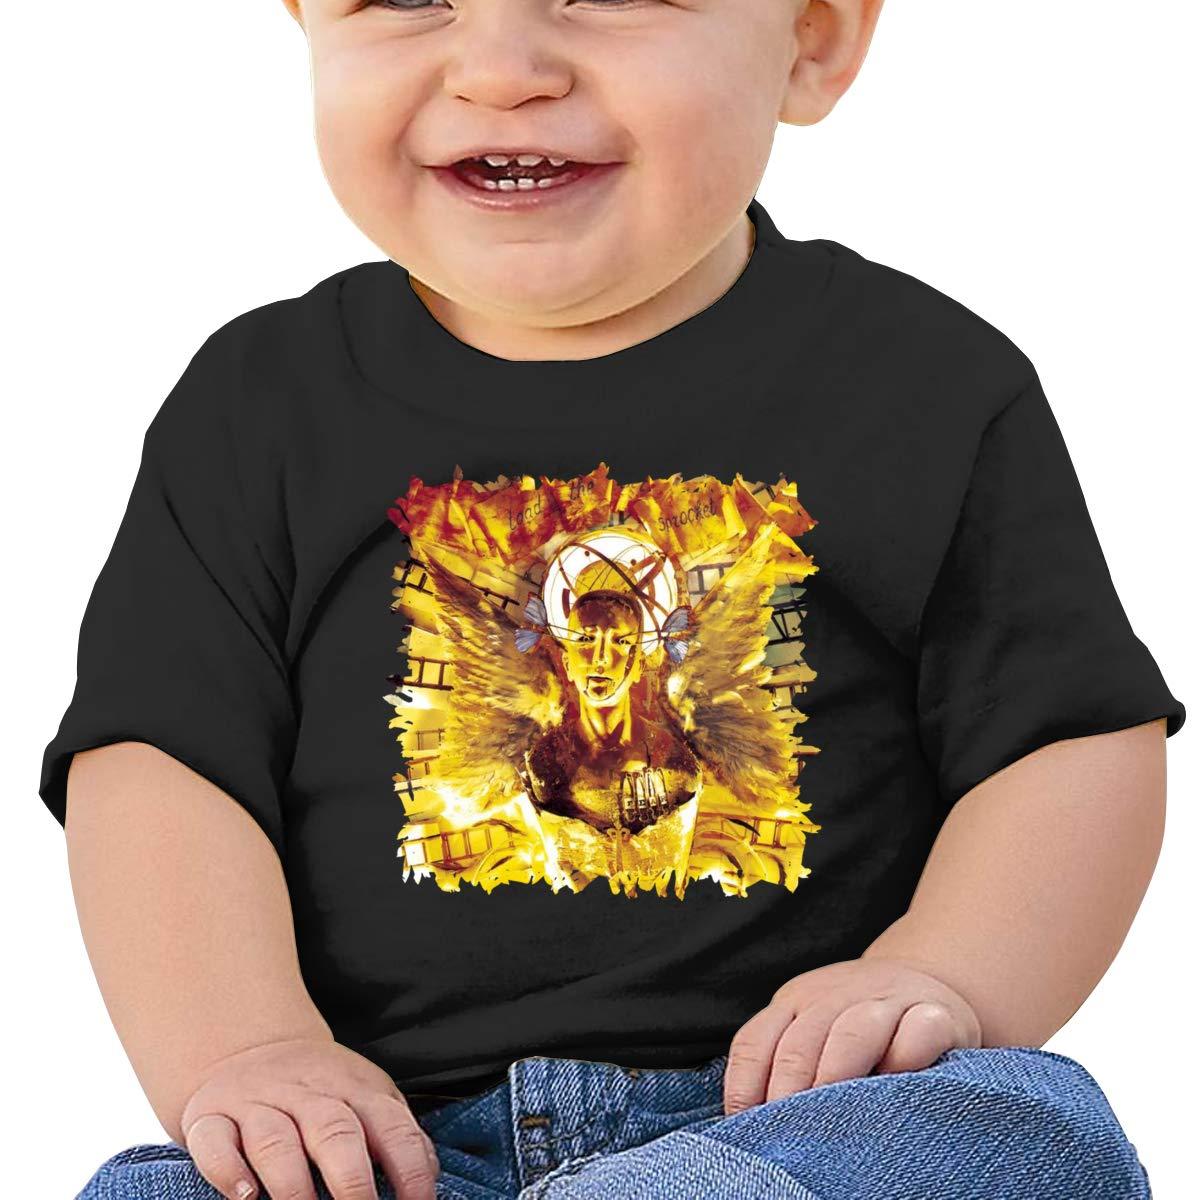 Kangtians Baby Toad The Wet Sprocket Short Sleeve Shirt Toddler Tee